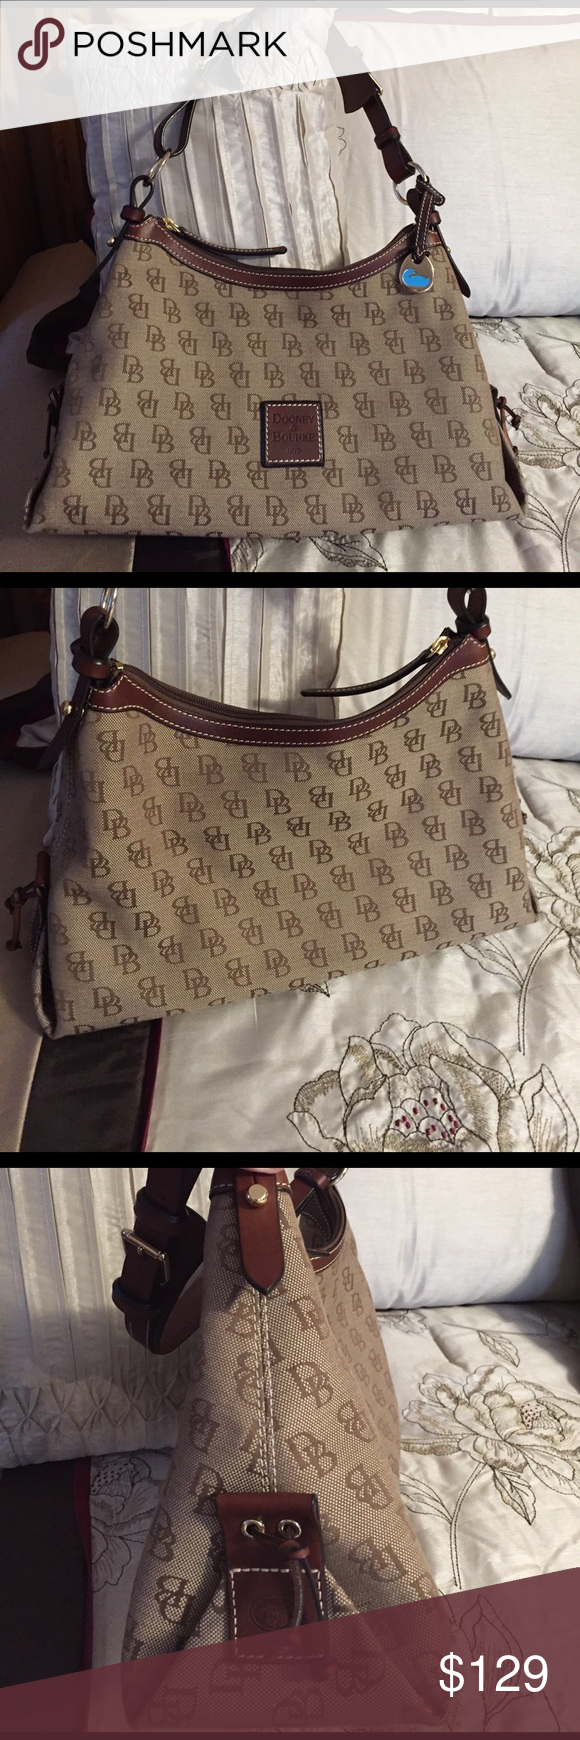 Dooney & Bourke Shoulder Bag Brown monogram, brown leather and goldtone accents. Preloved, but in great condition. Dooney & Bourke Bags Shoulder Bags